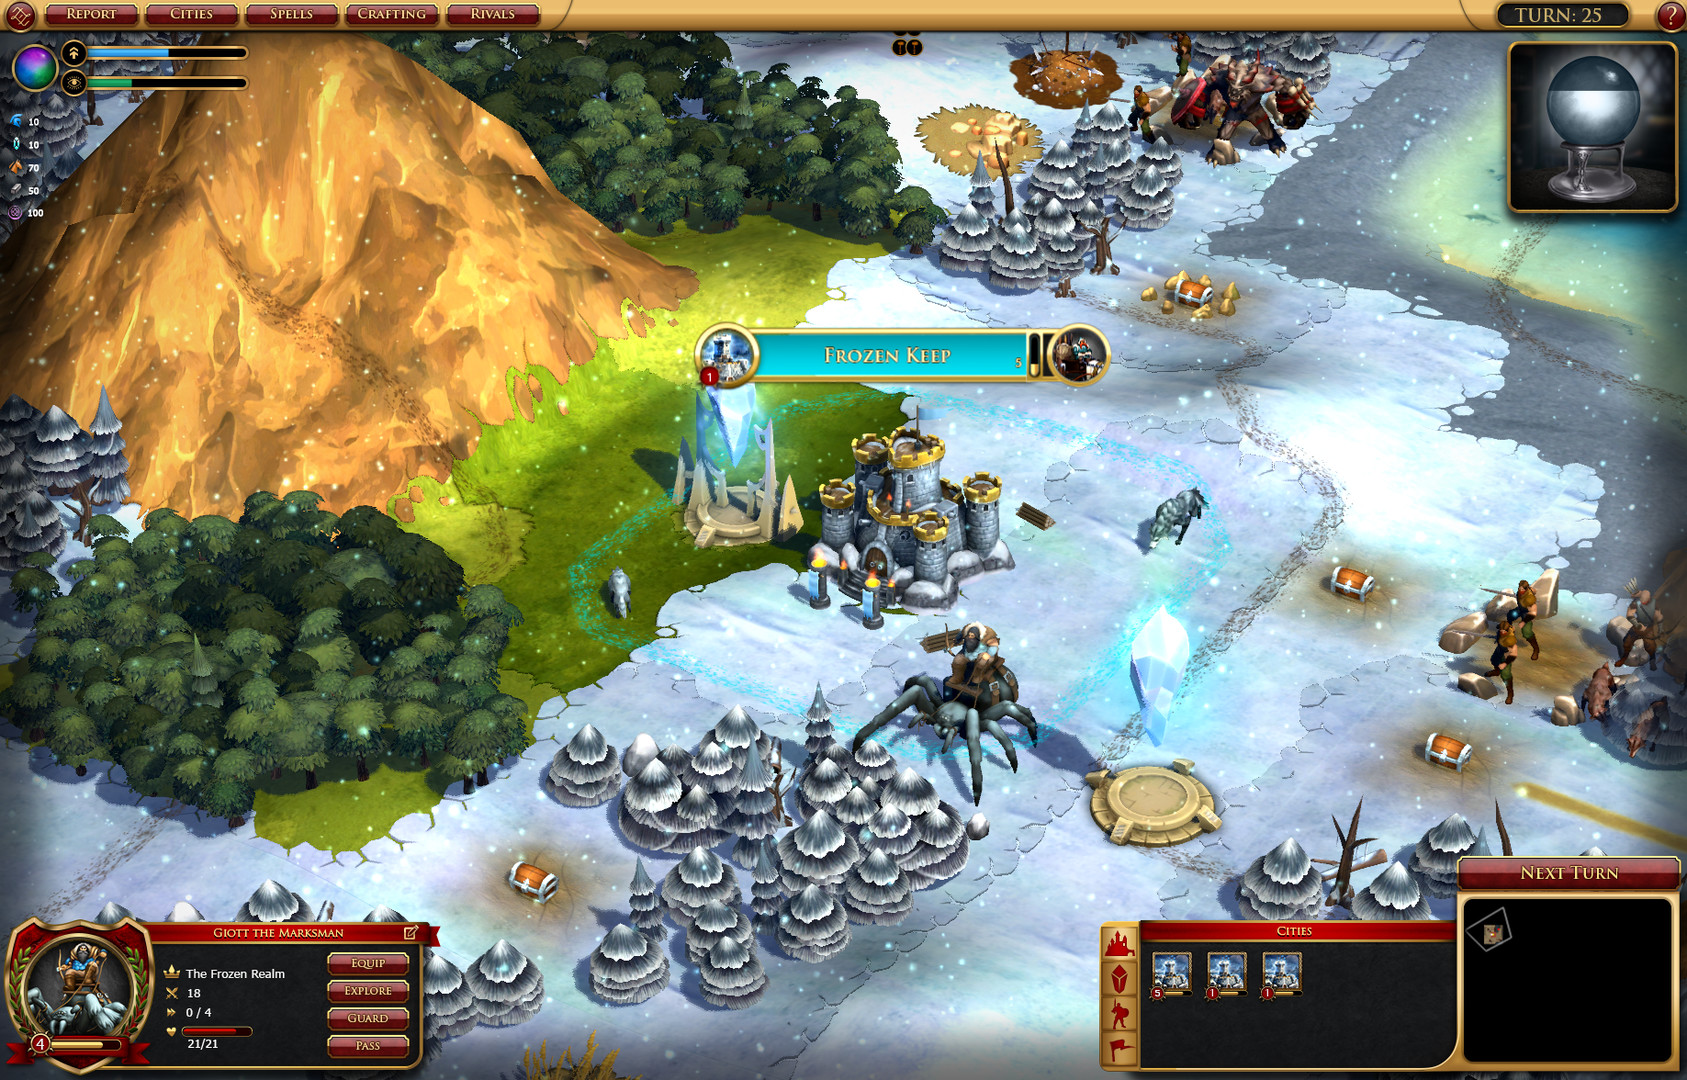 Sorcerer King: Rivals Screenshot 2